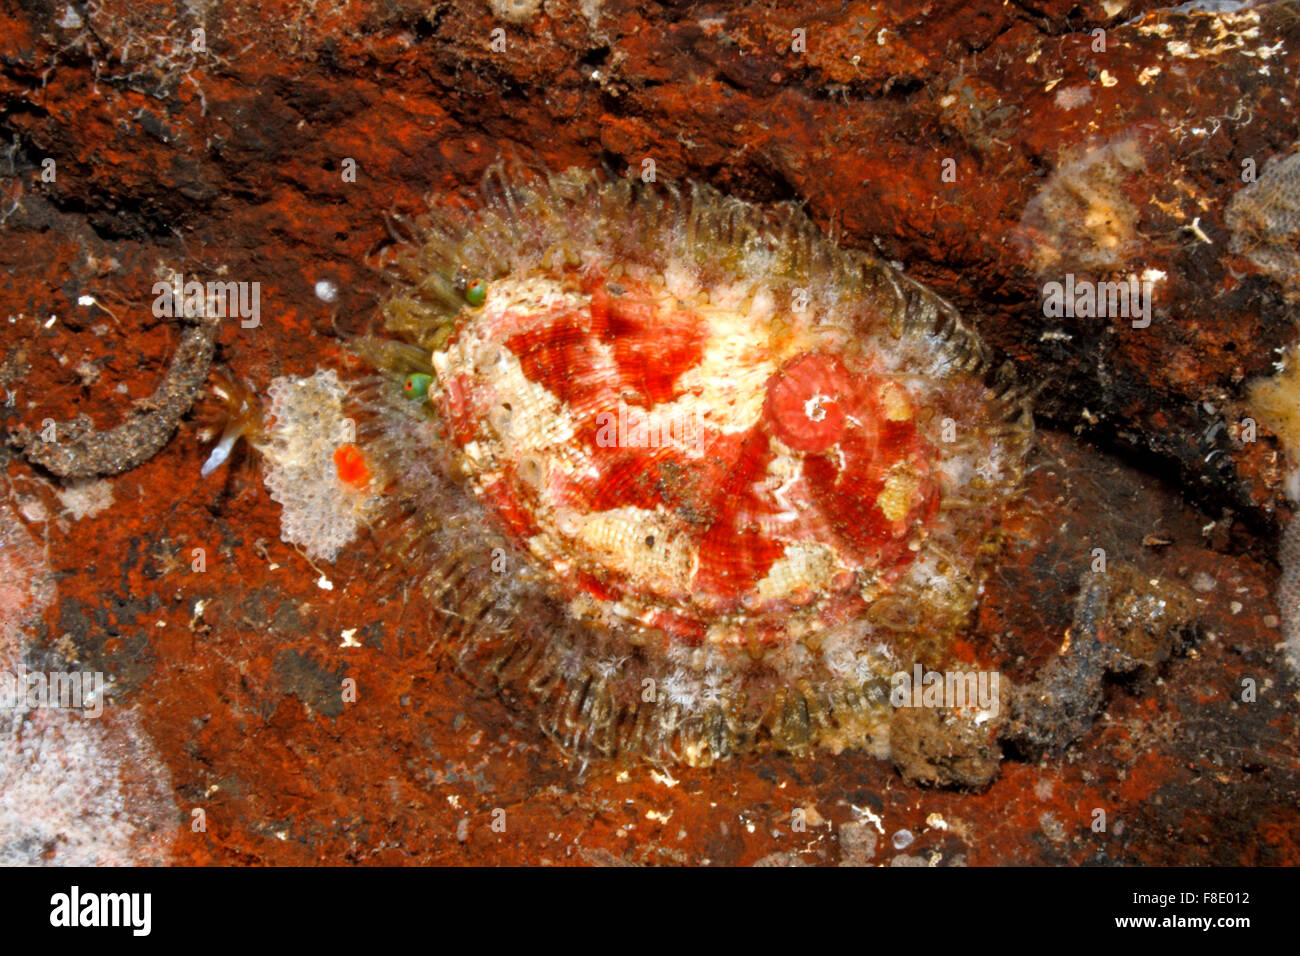 lovely-abalone-shell-haliotis-clathrata-tulamben-bali-indonesia-bali-F8E012.jpg